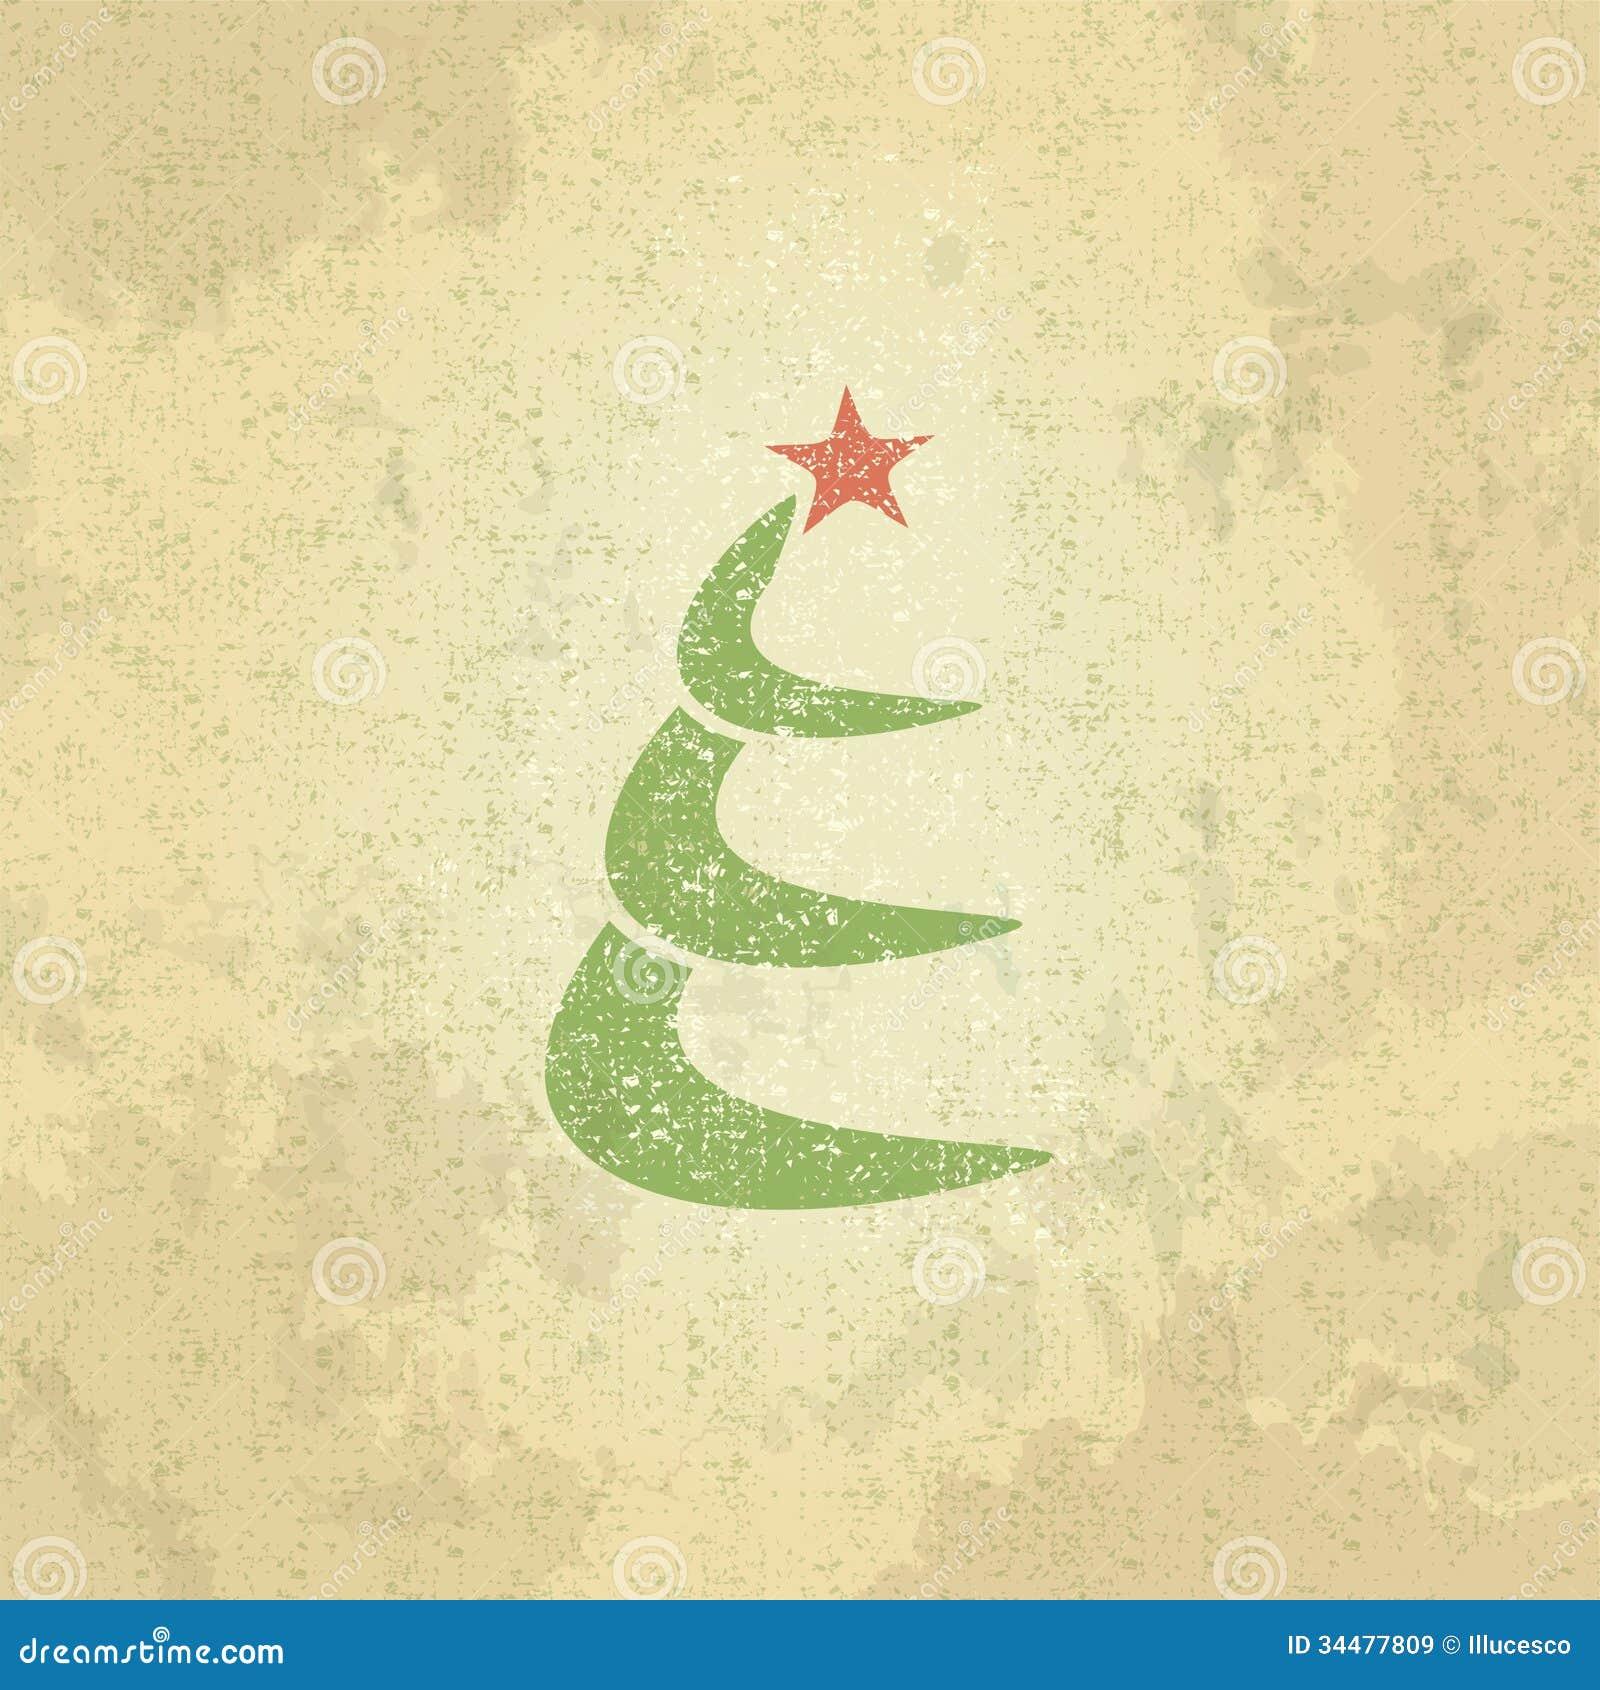 Retro Christmas Tree Royalty Free Stock Images - Image ...